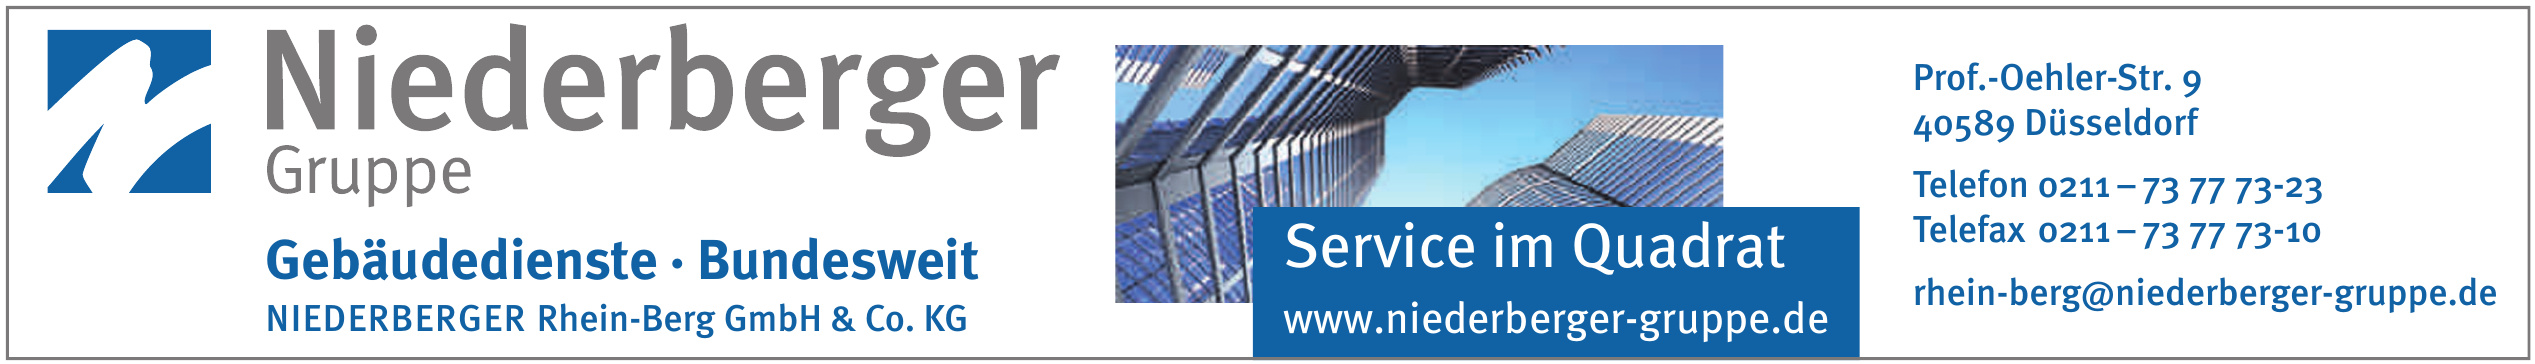 Niederberger Rhein-Berg GmbH & Co. KG